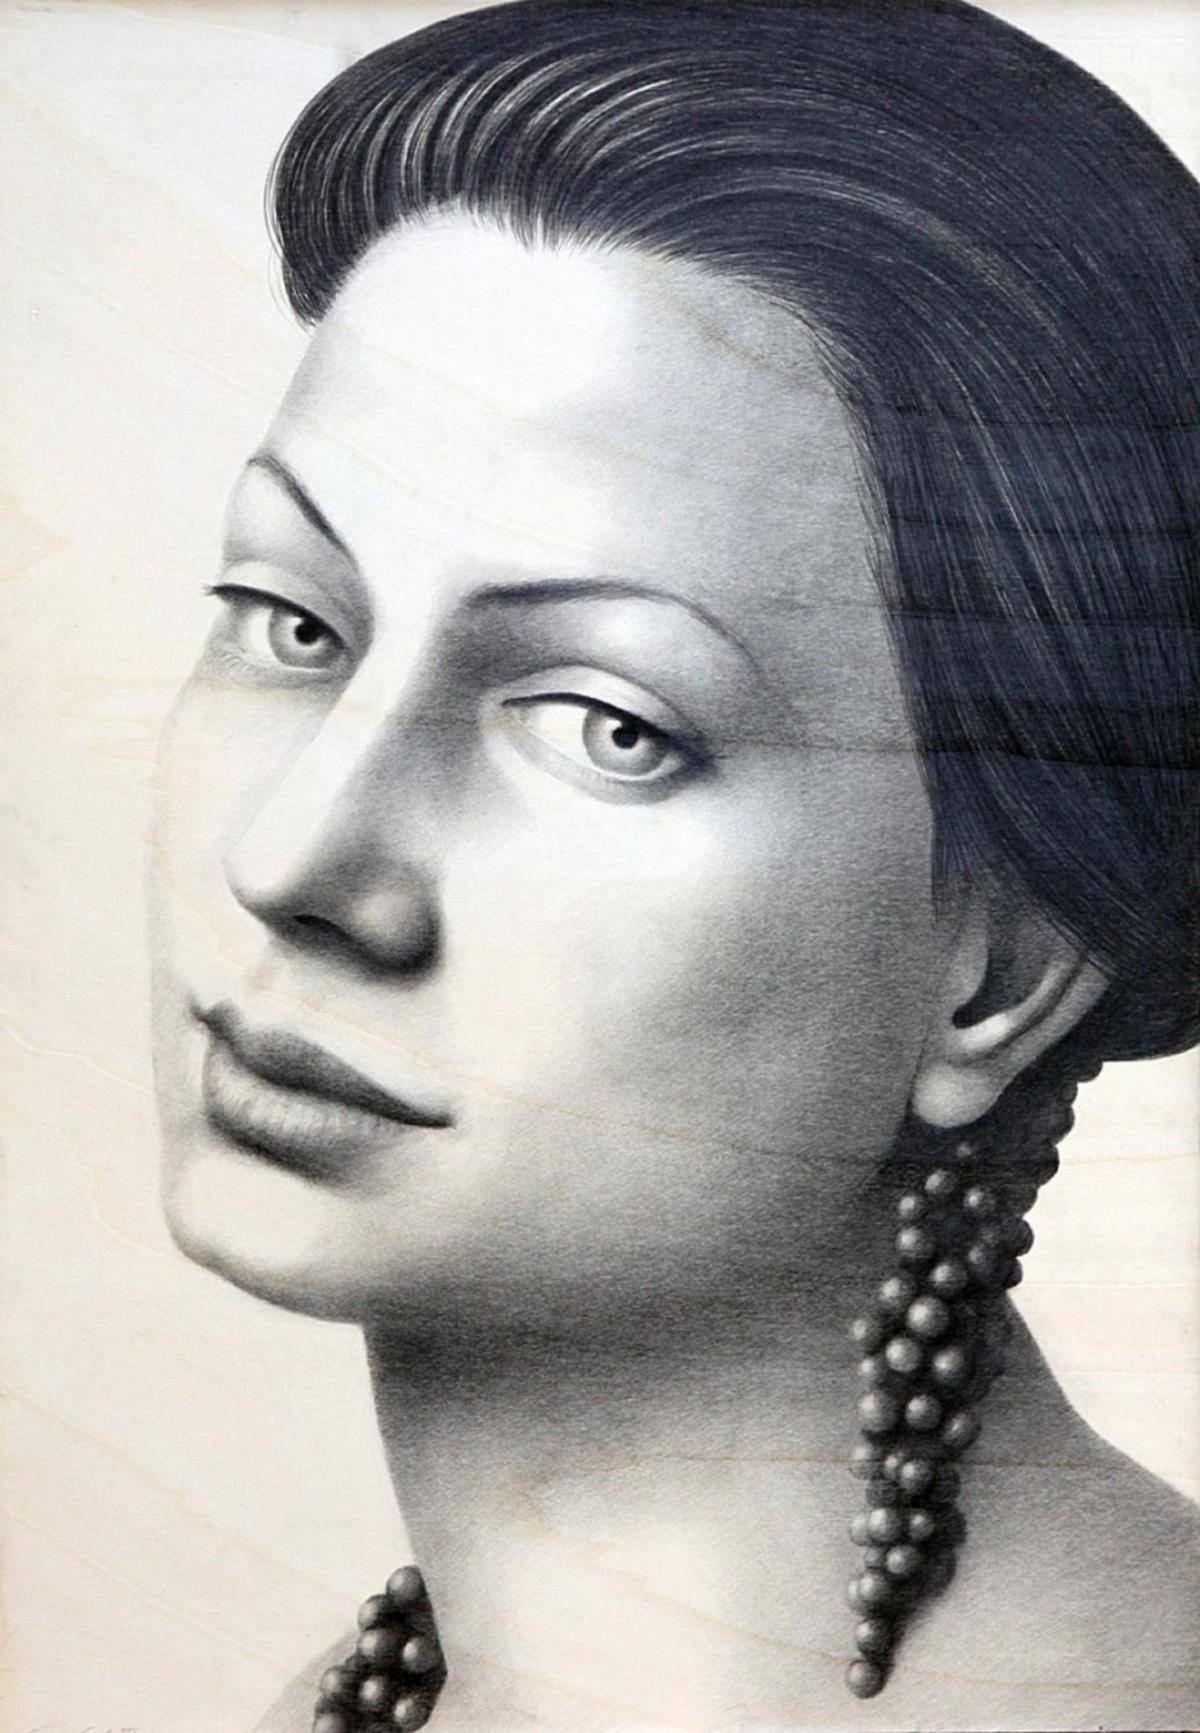 Franco-Giletta-2-etra-studio-tommasi